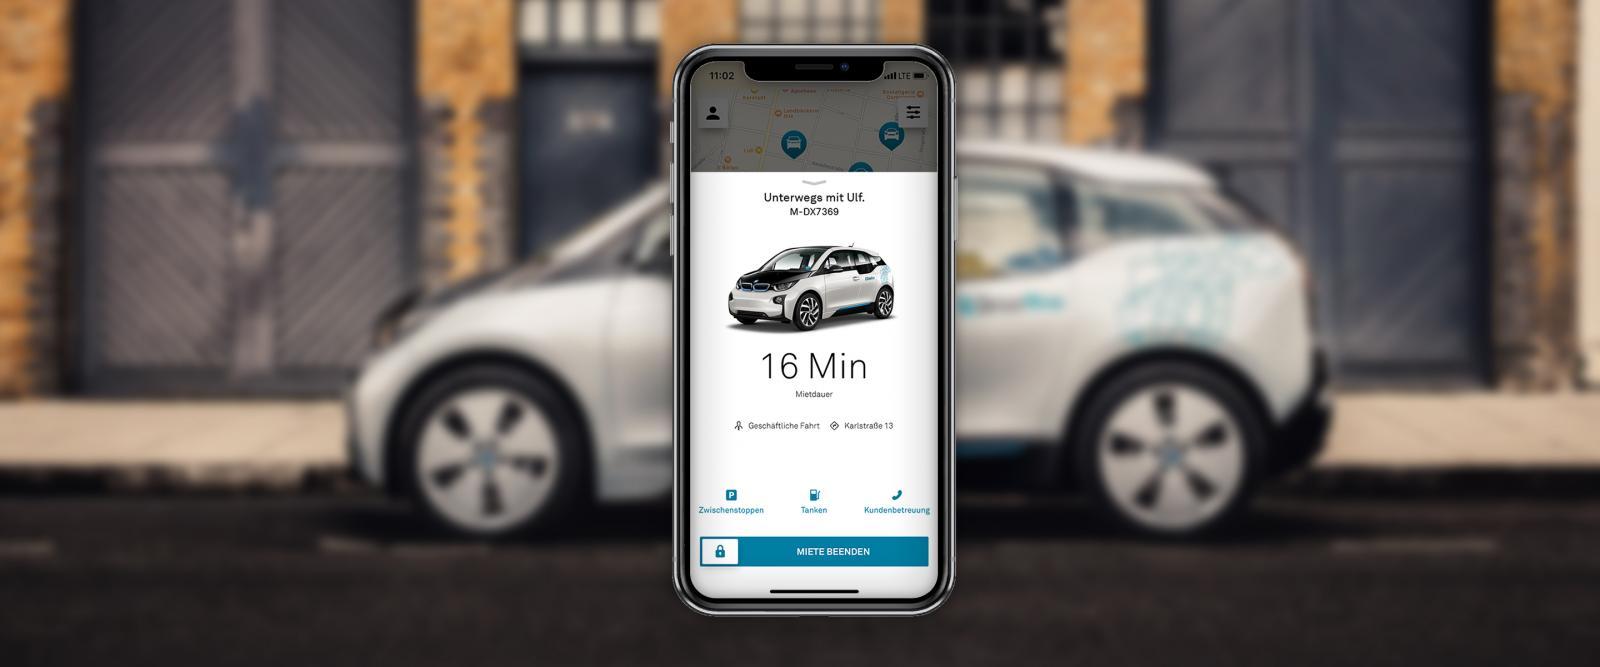 drivenow-carsharing-wien-app-update